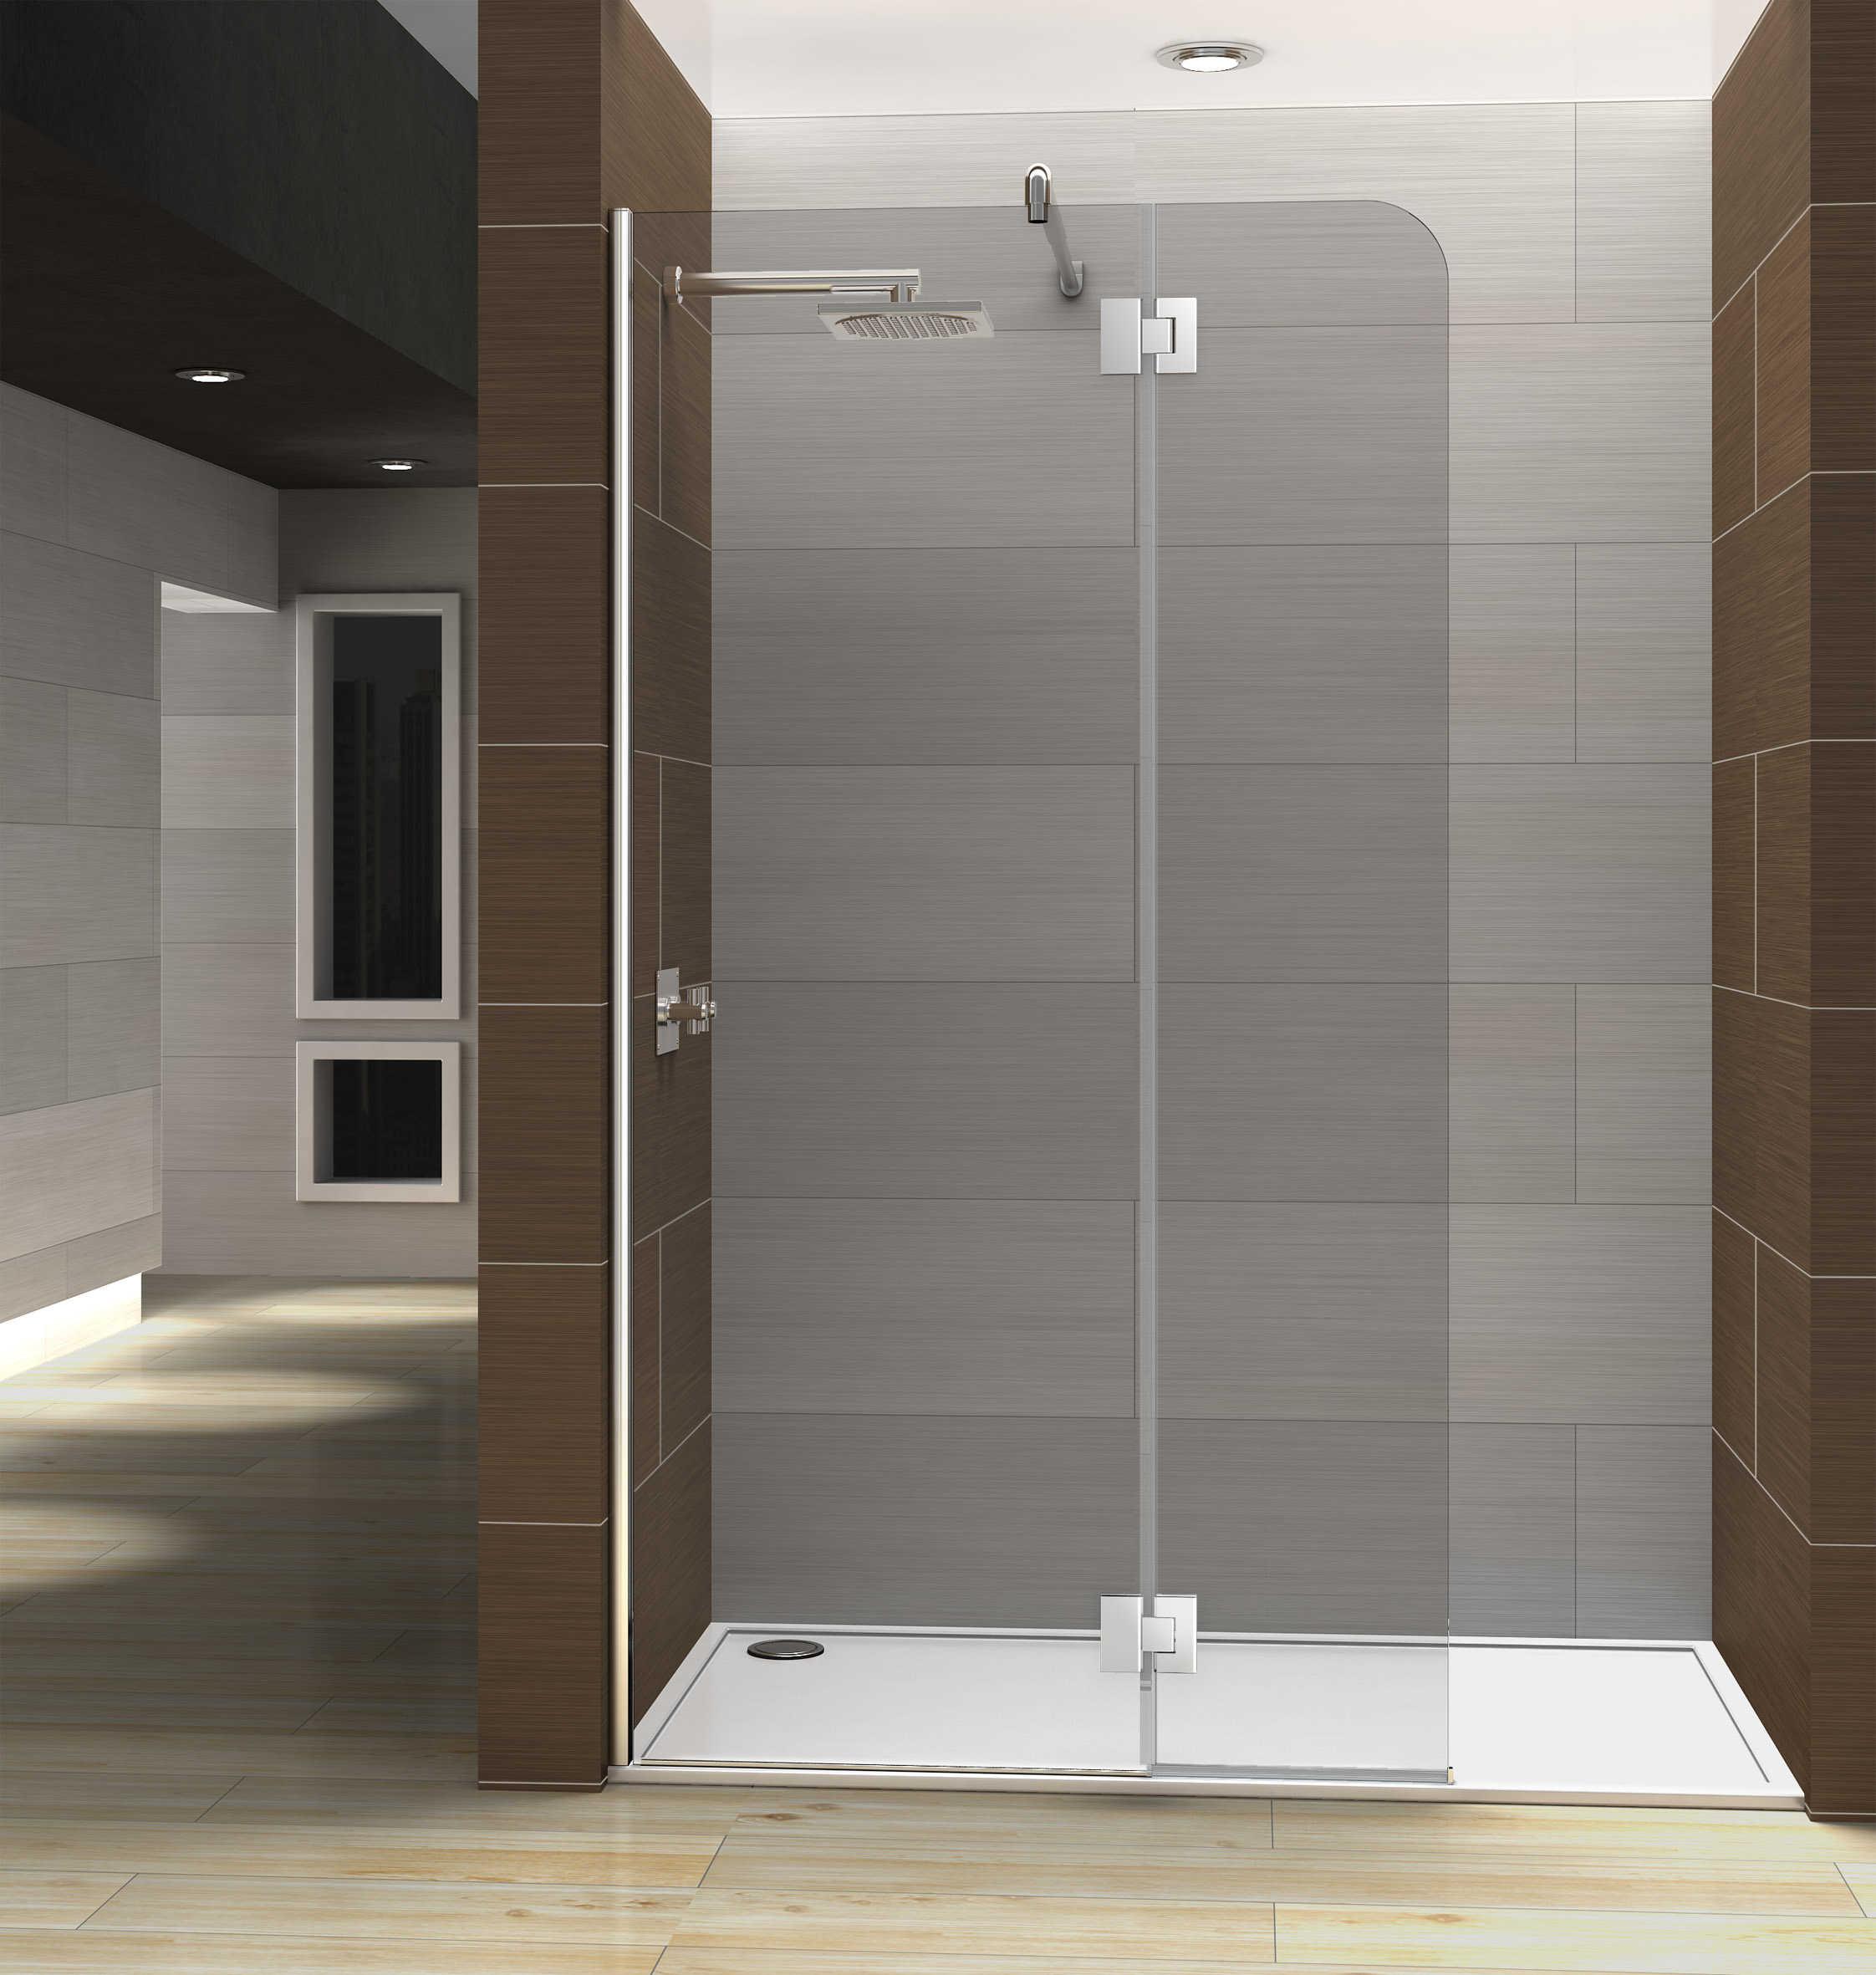 Modelo xenior sport 90 d mamparas de ducha hnos p rez for Muebles para ducha